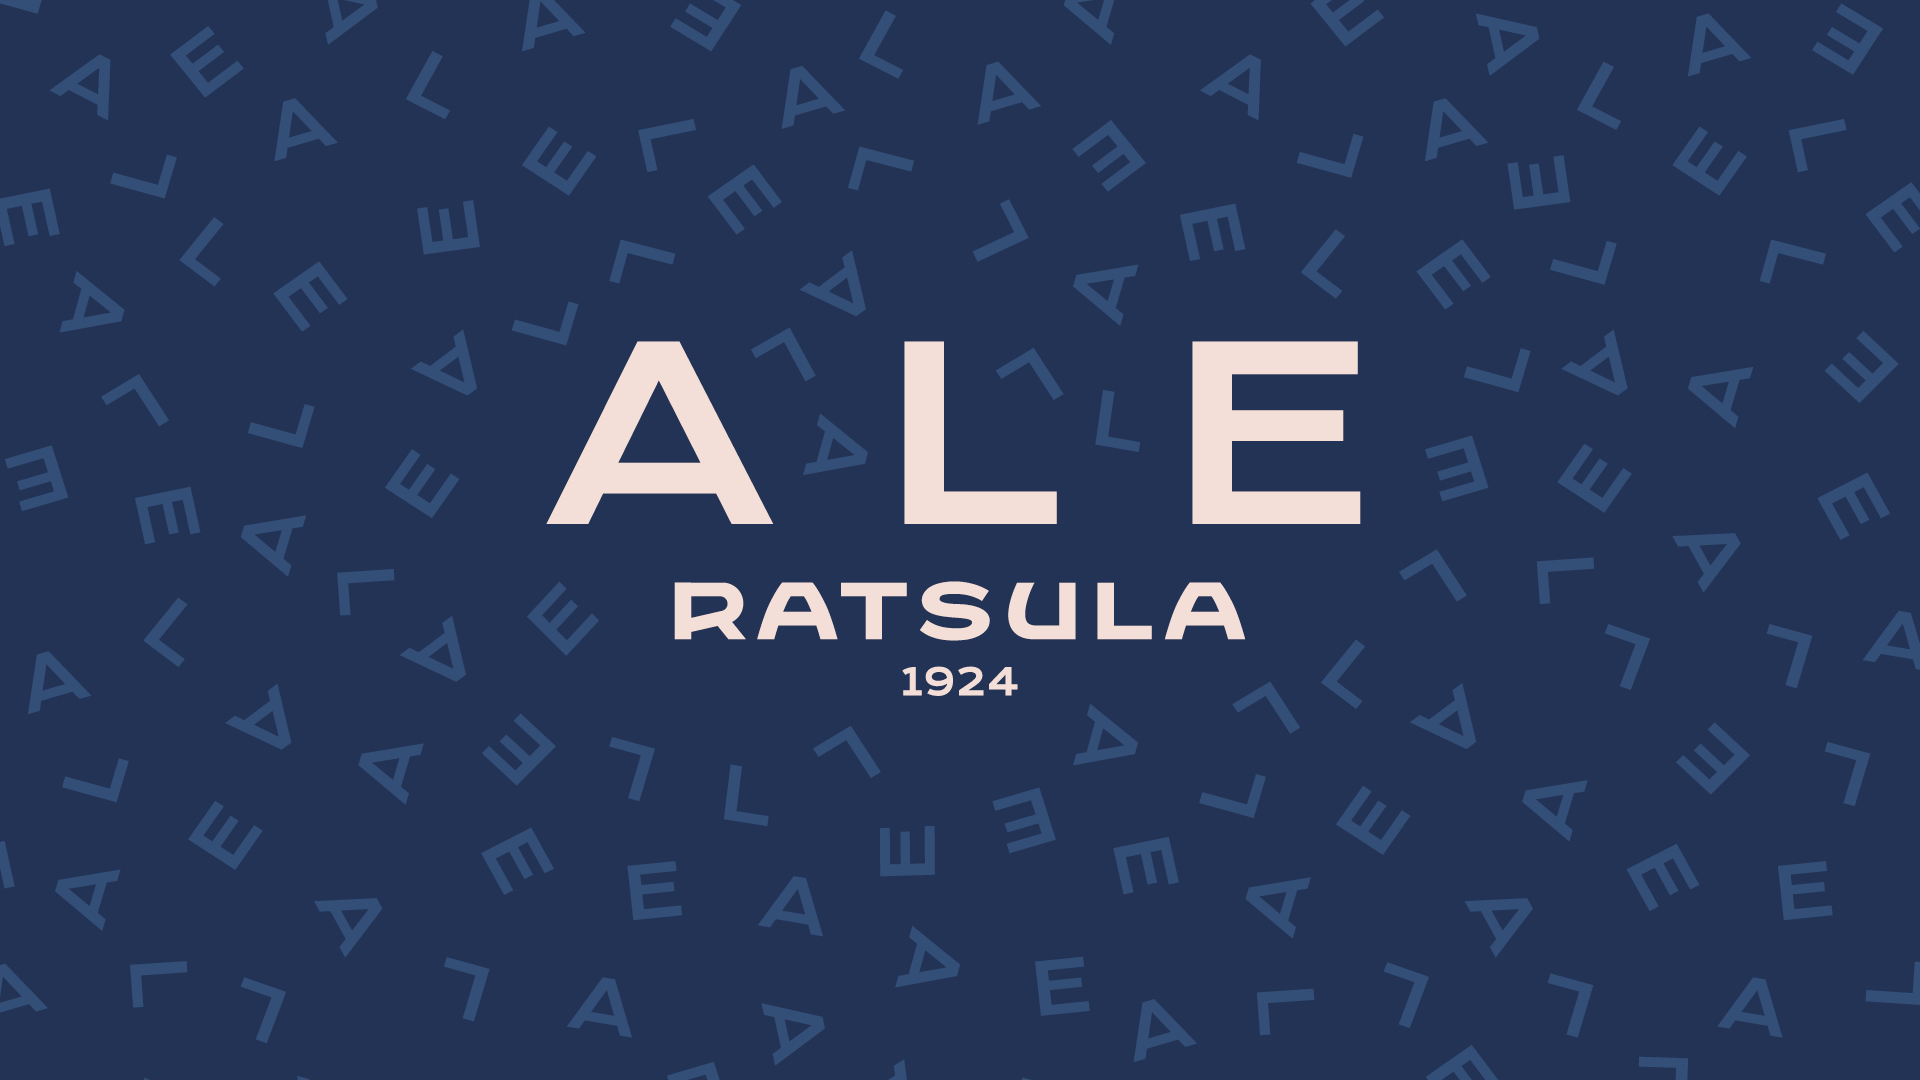 Ratsula - 1924